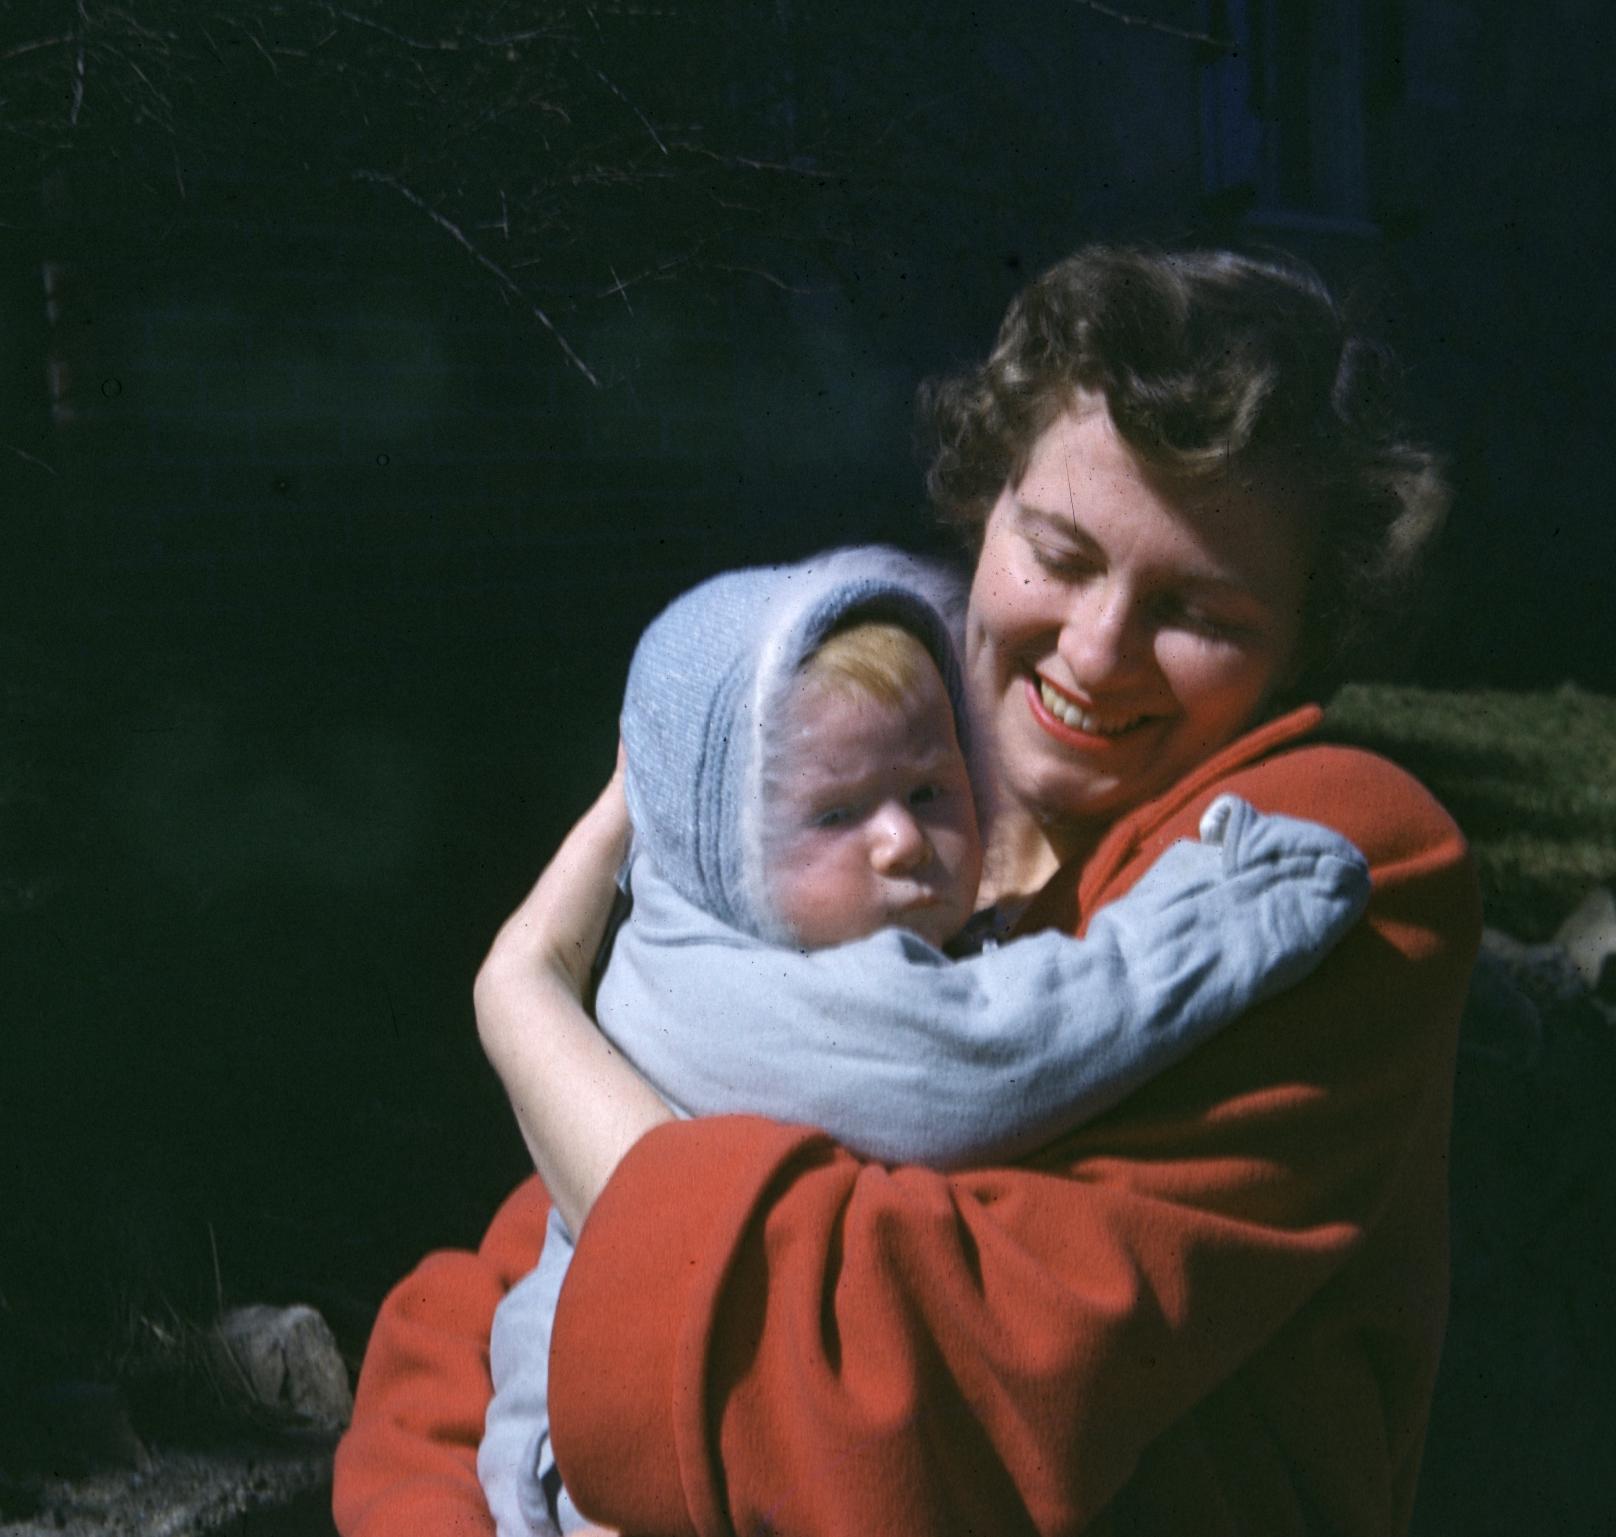 1947 Granddaddy_s picsa0008.01.jpg